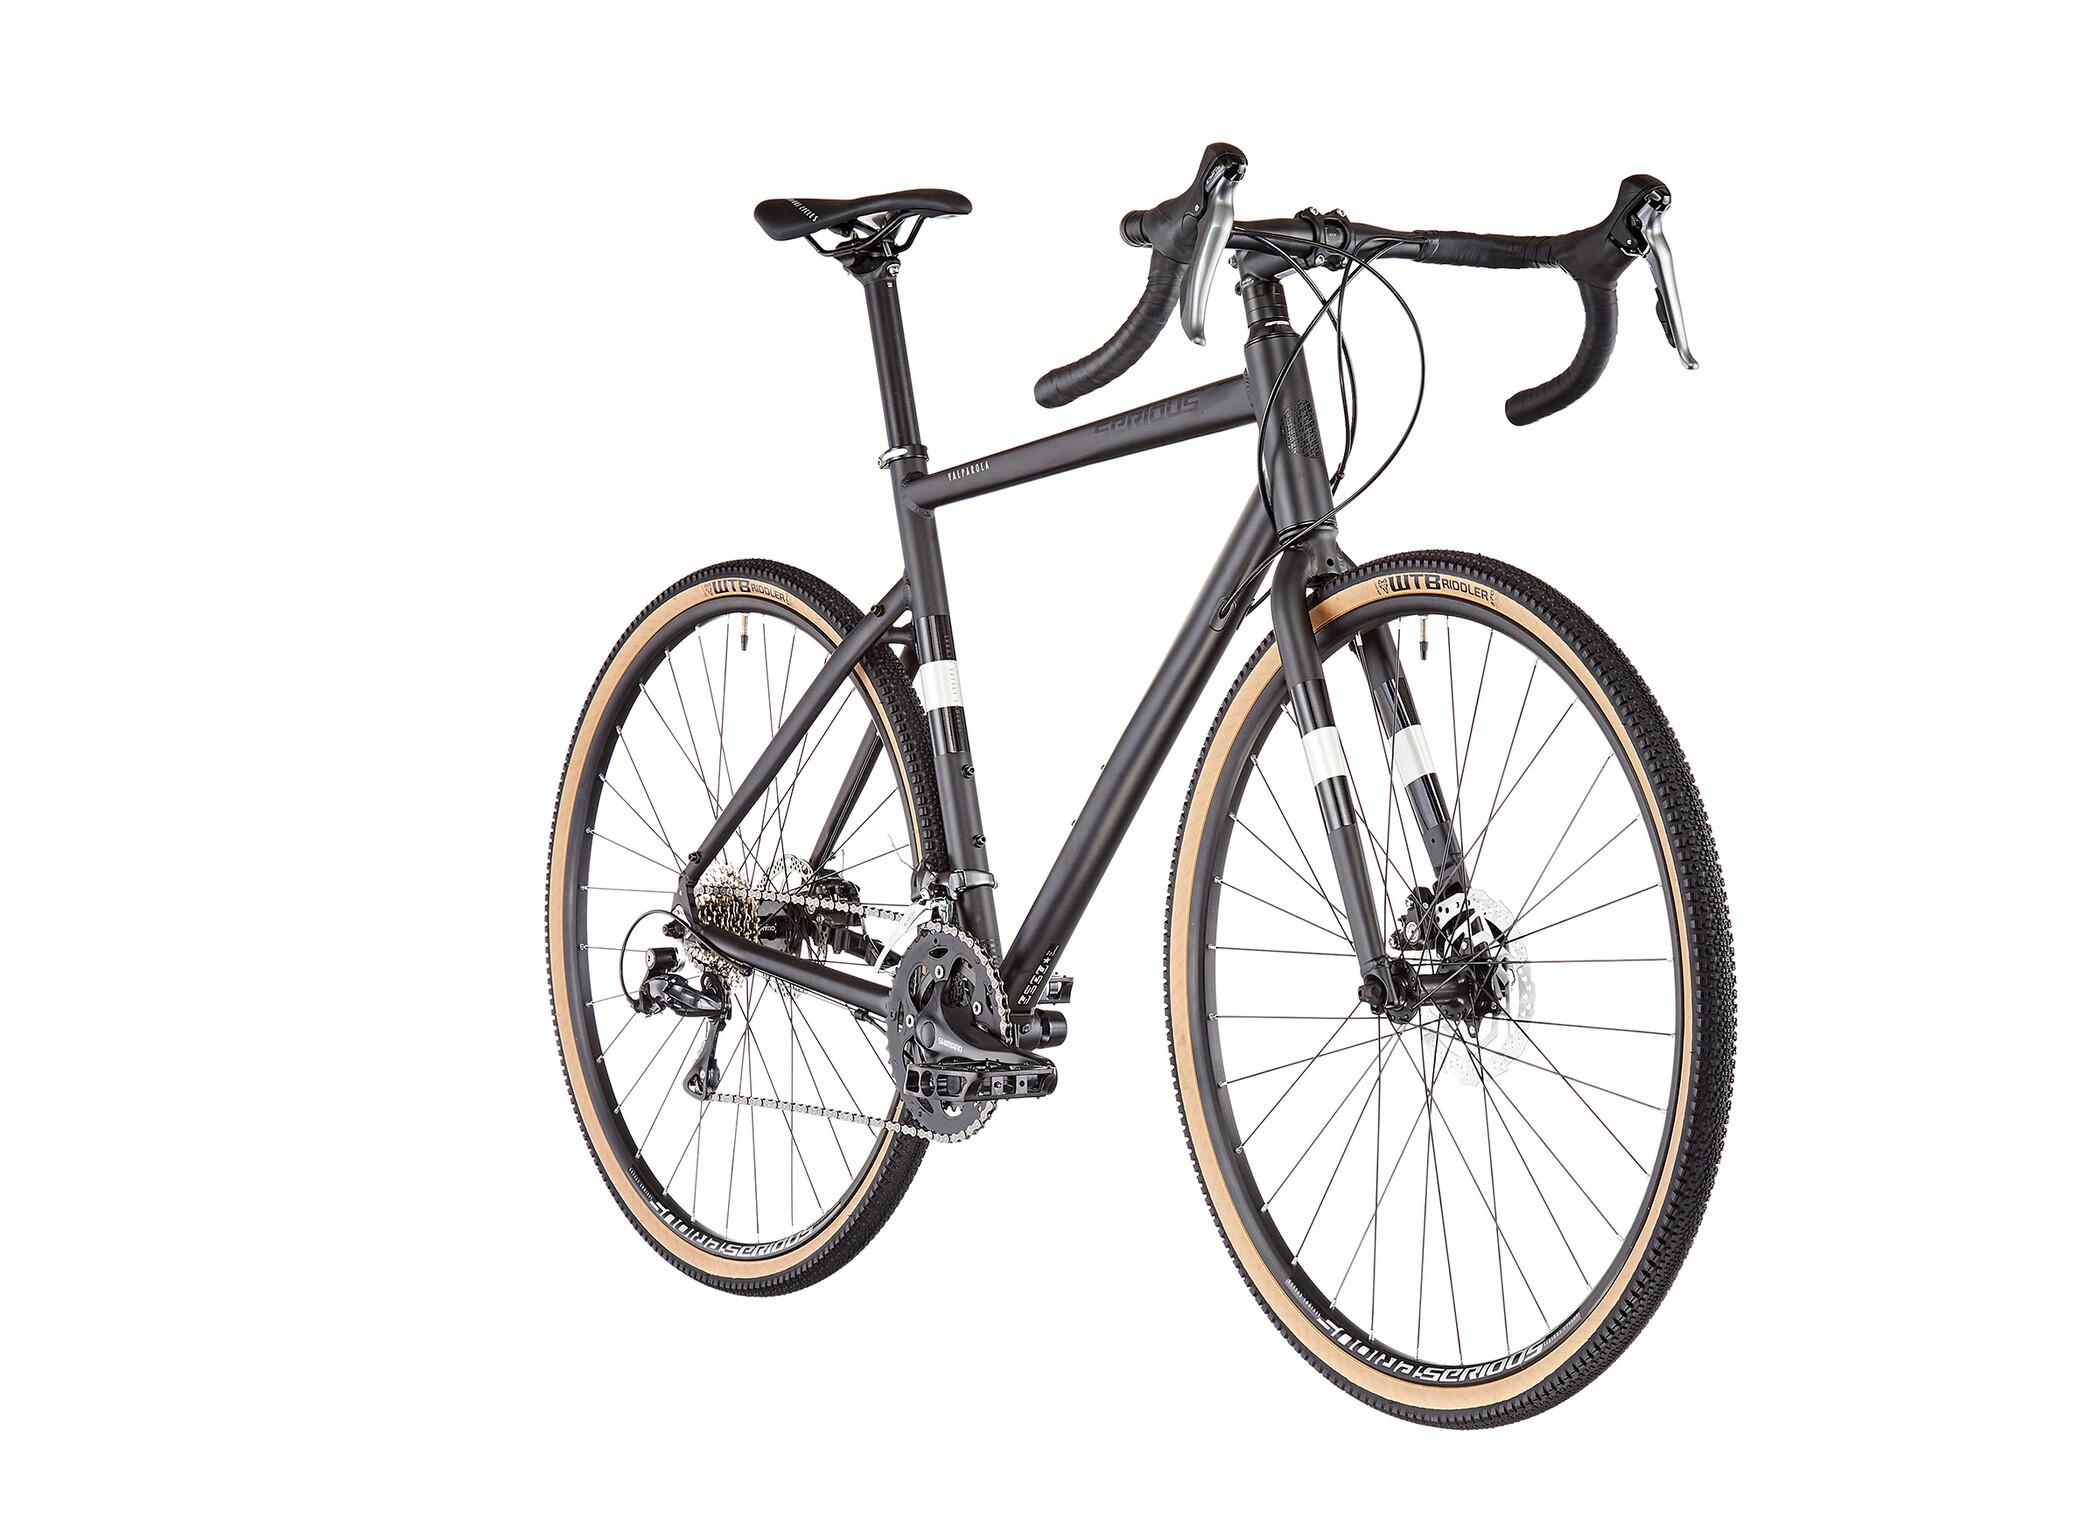 Valparola, sort | bike frame